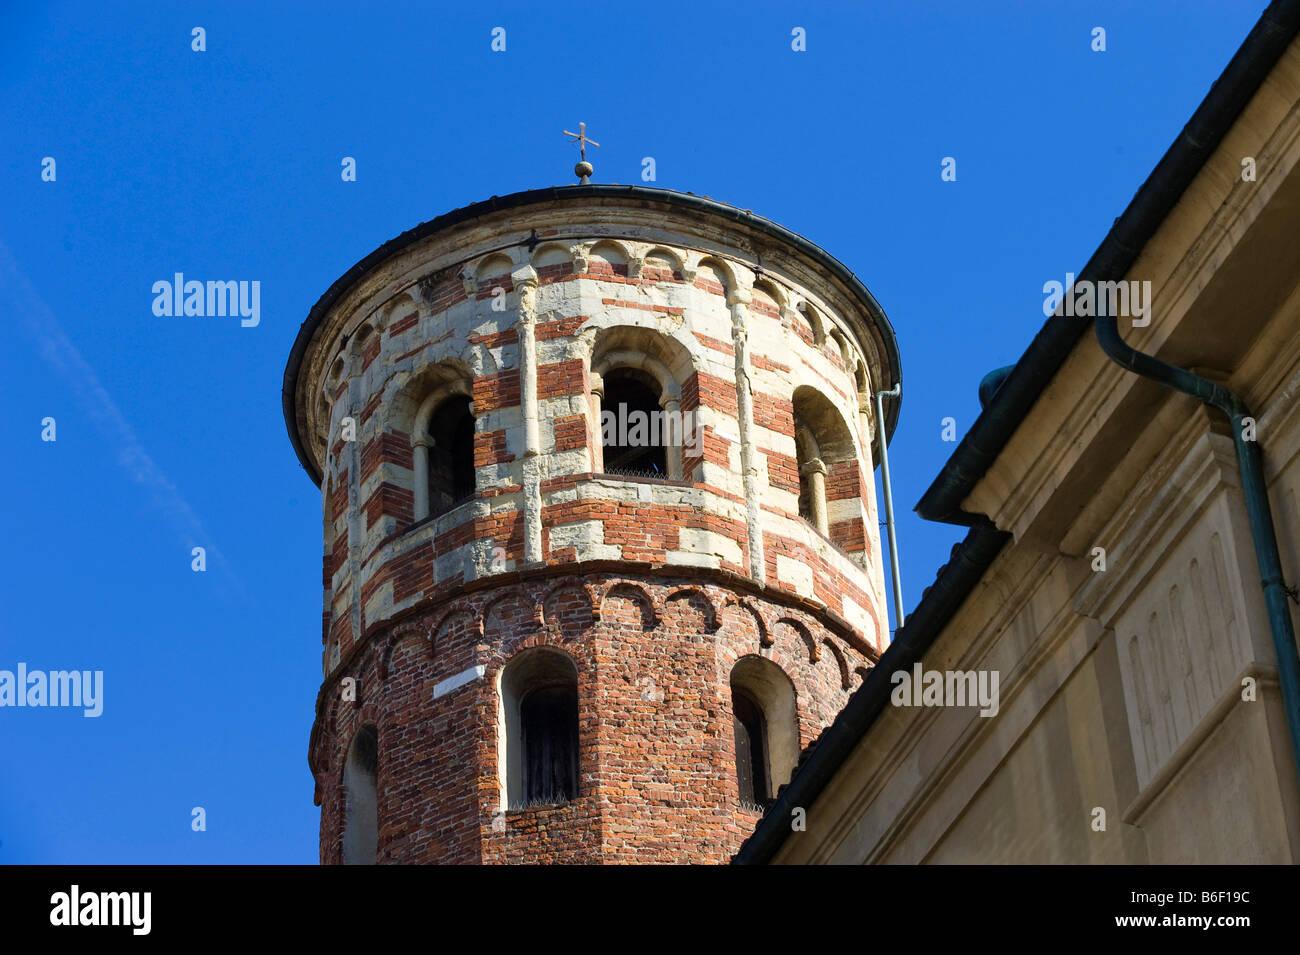 Torre Rossa, Asti, Piemont, Italy, Europe - Stock Image